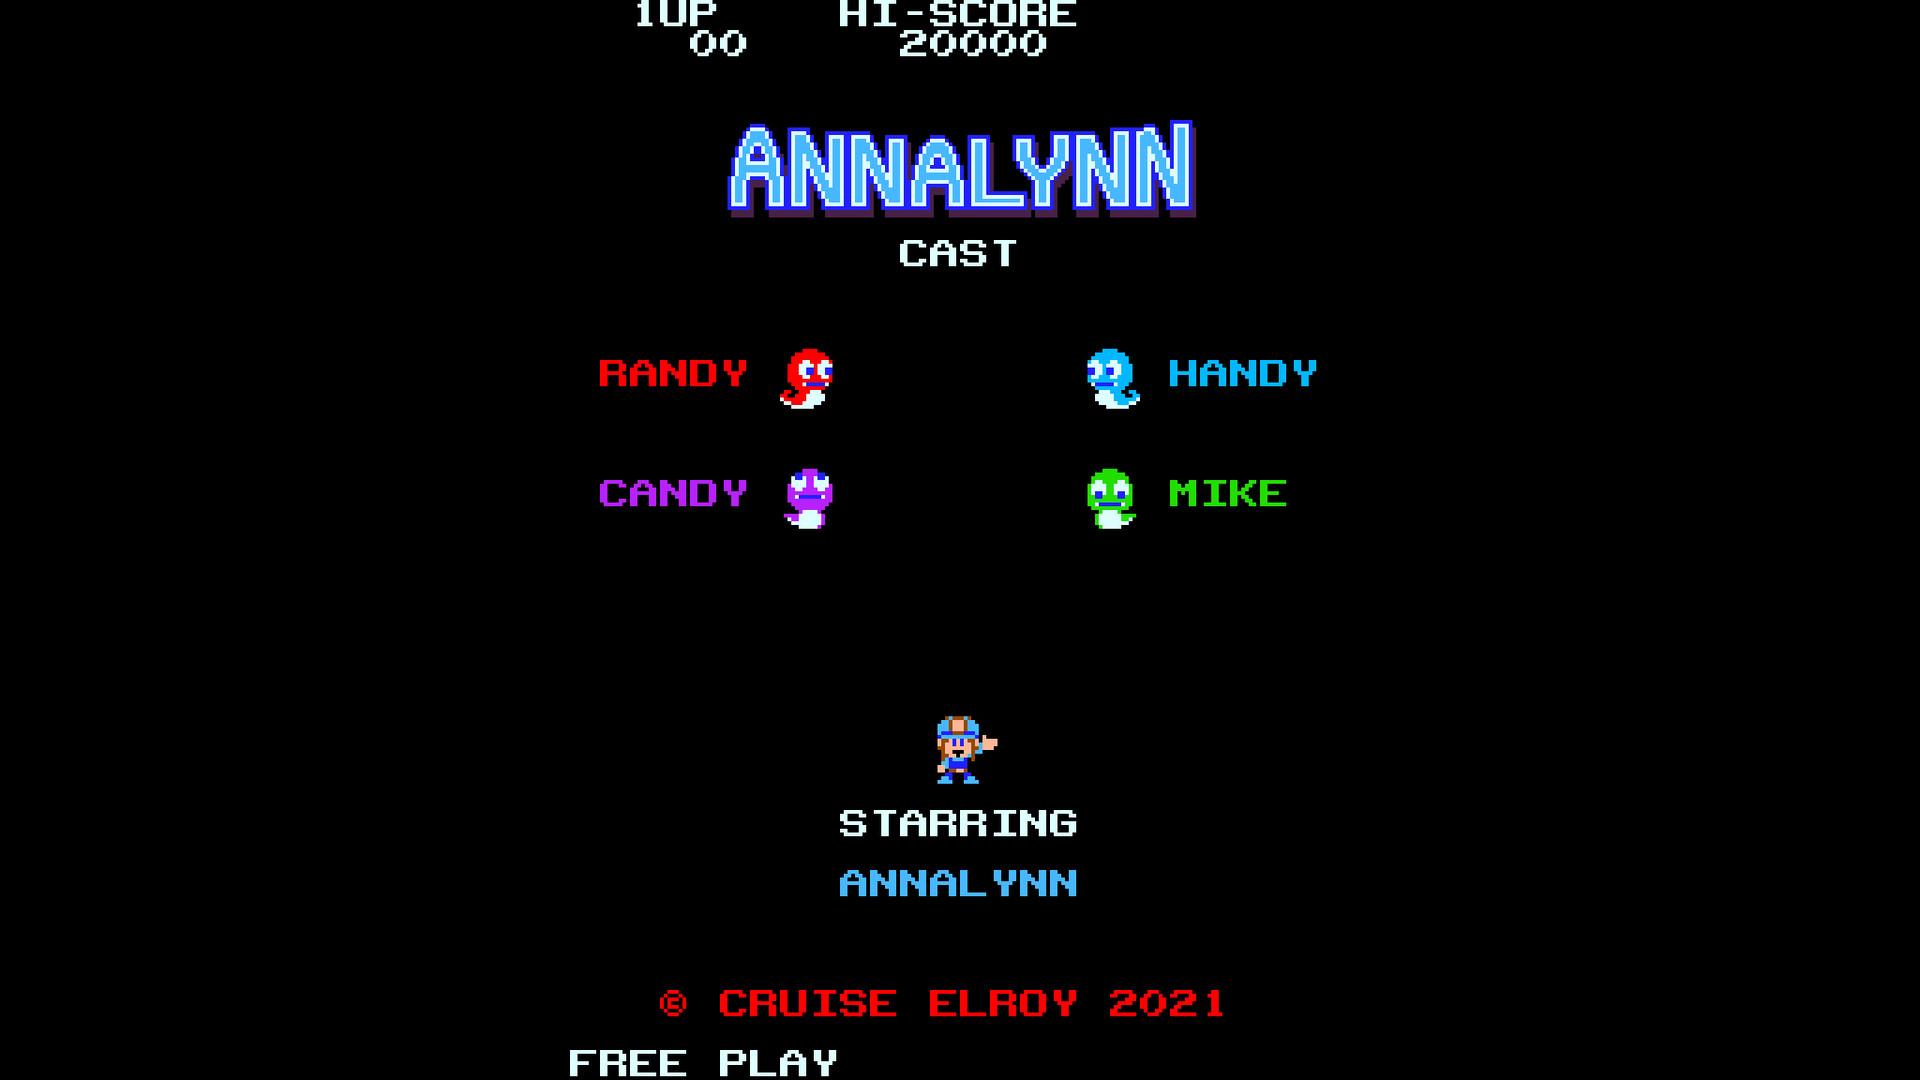 Find the best laptops for Annalynn